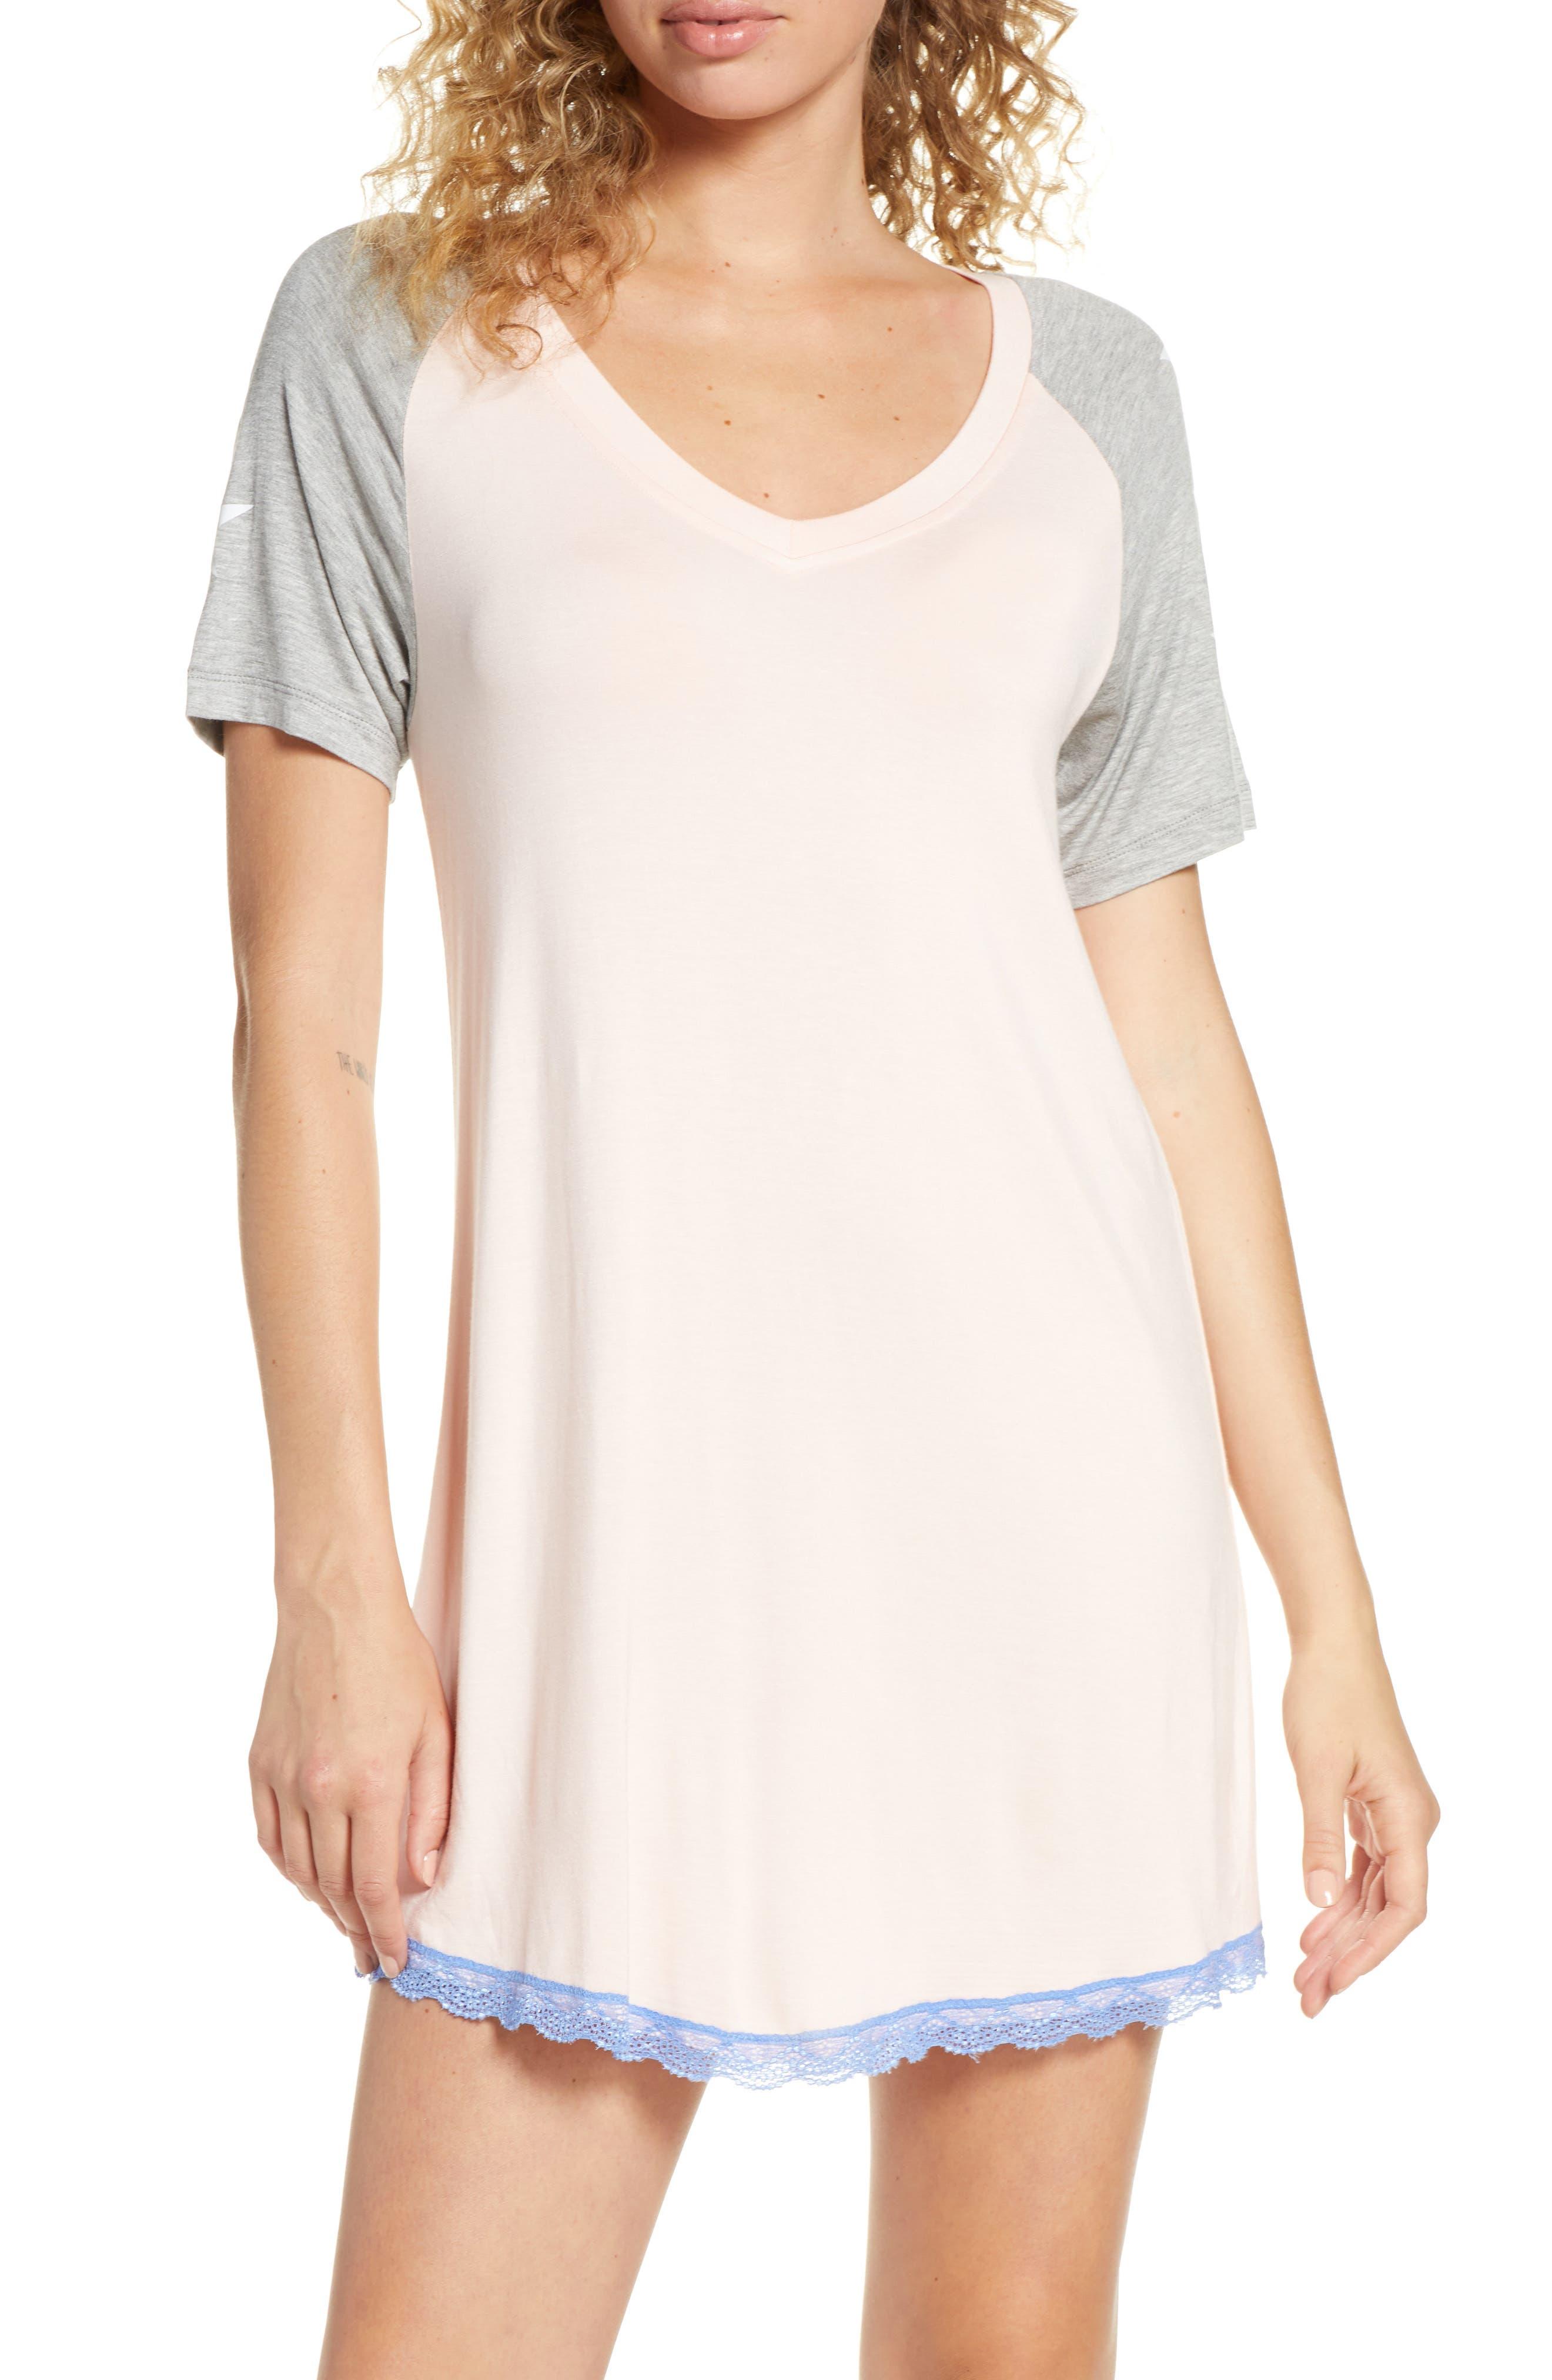 Honeydew Intimates All American Sleep Shirt, Pink